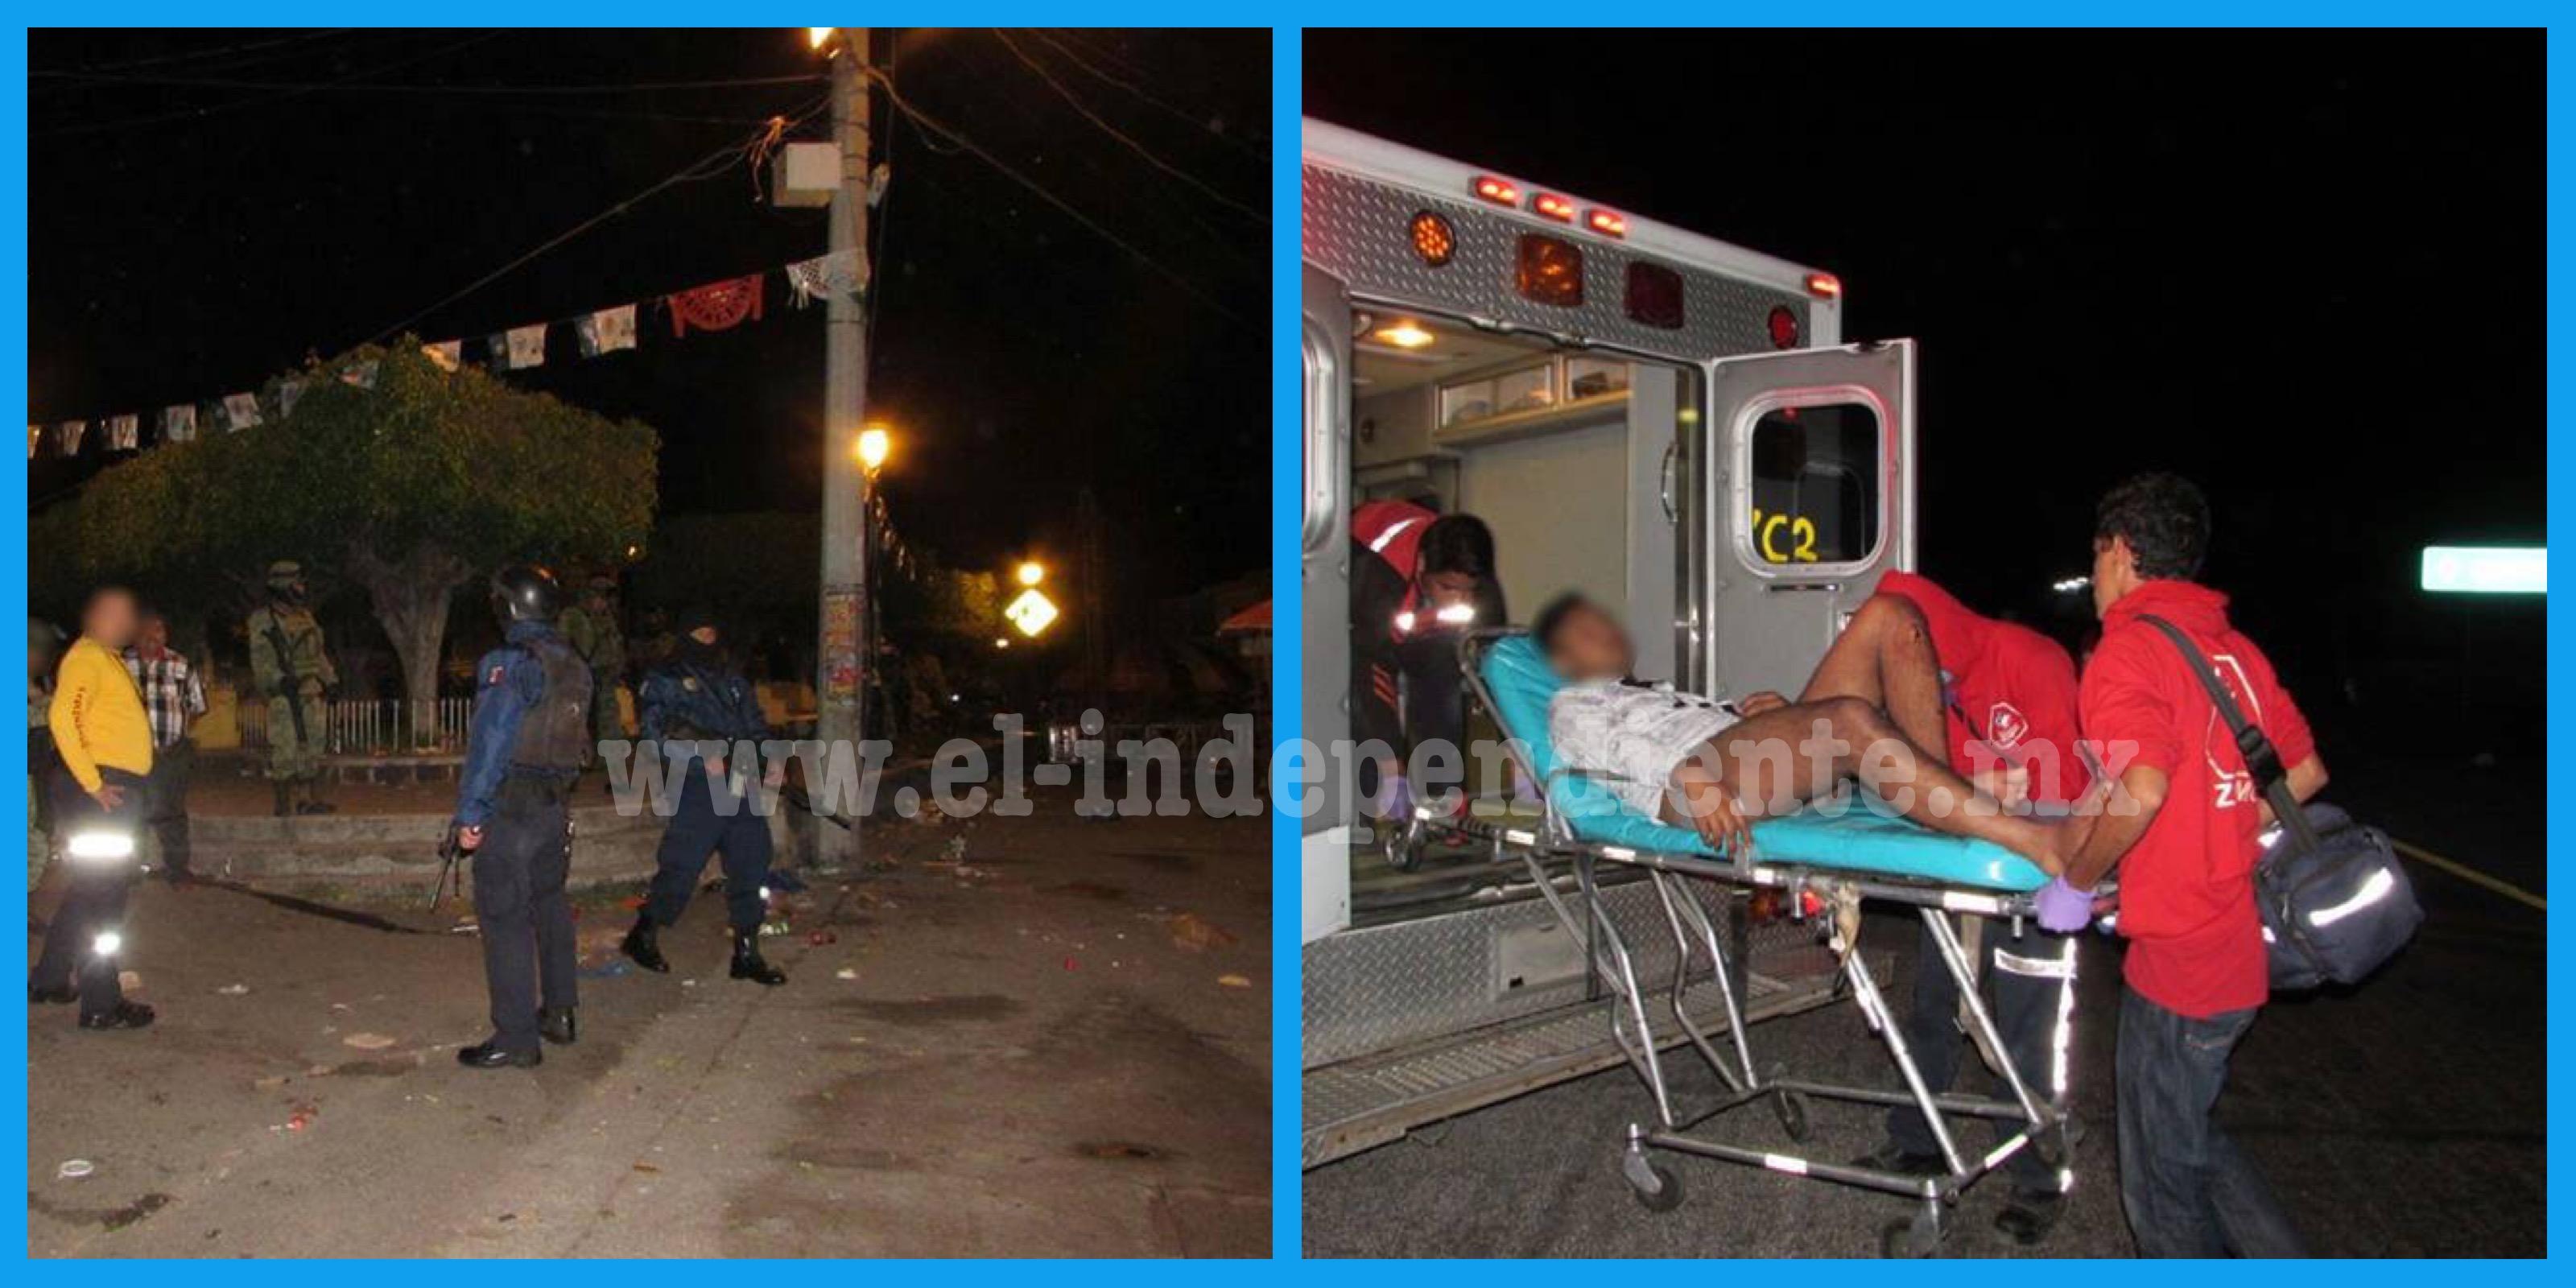 Fiesta en La Rinconada se tiñe de sangre; 4 lesionados por bala